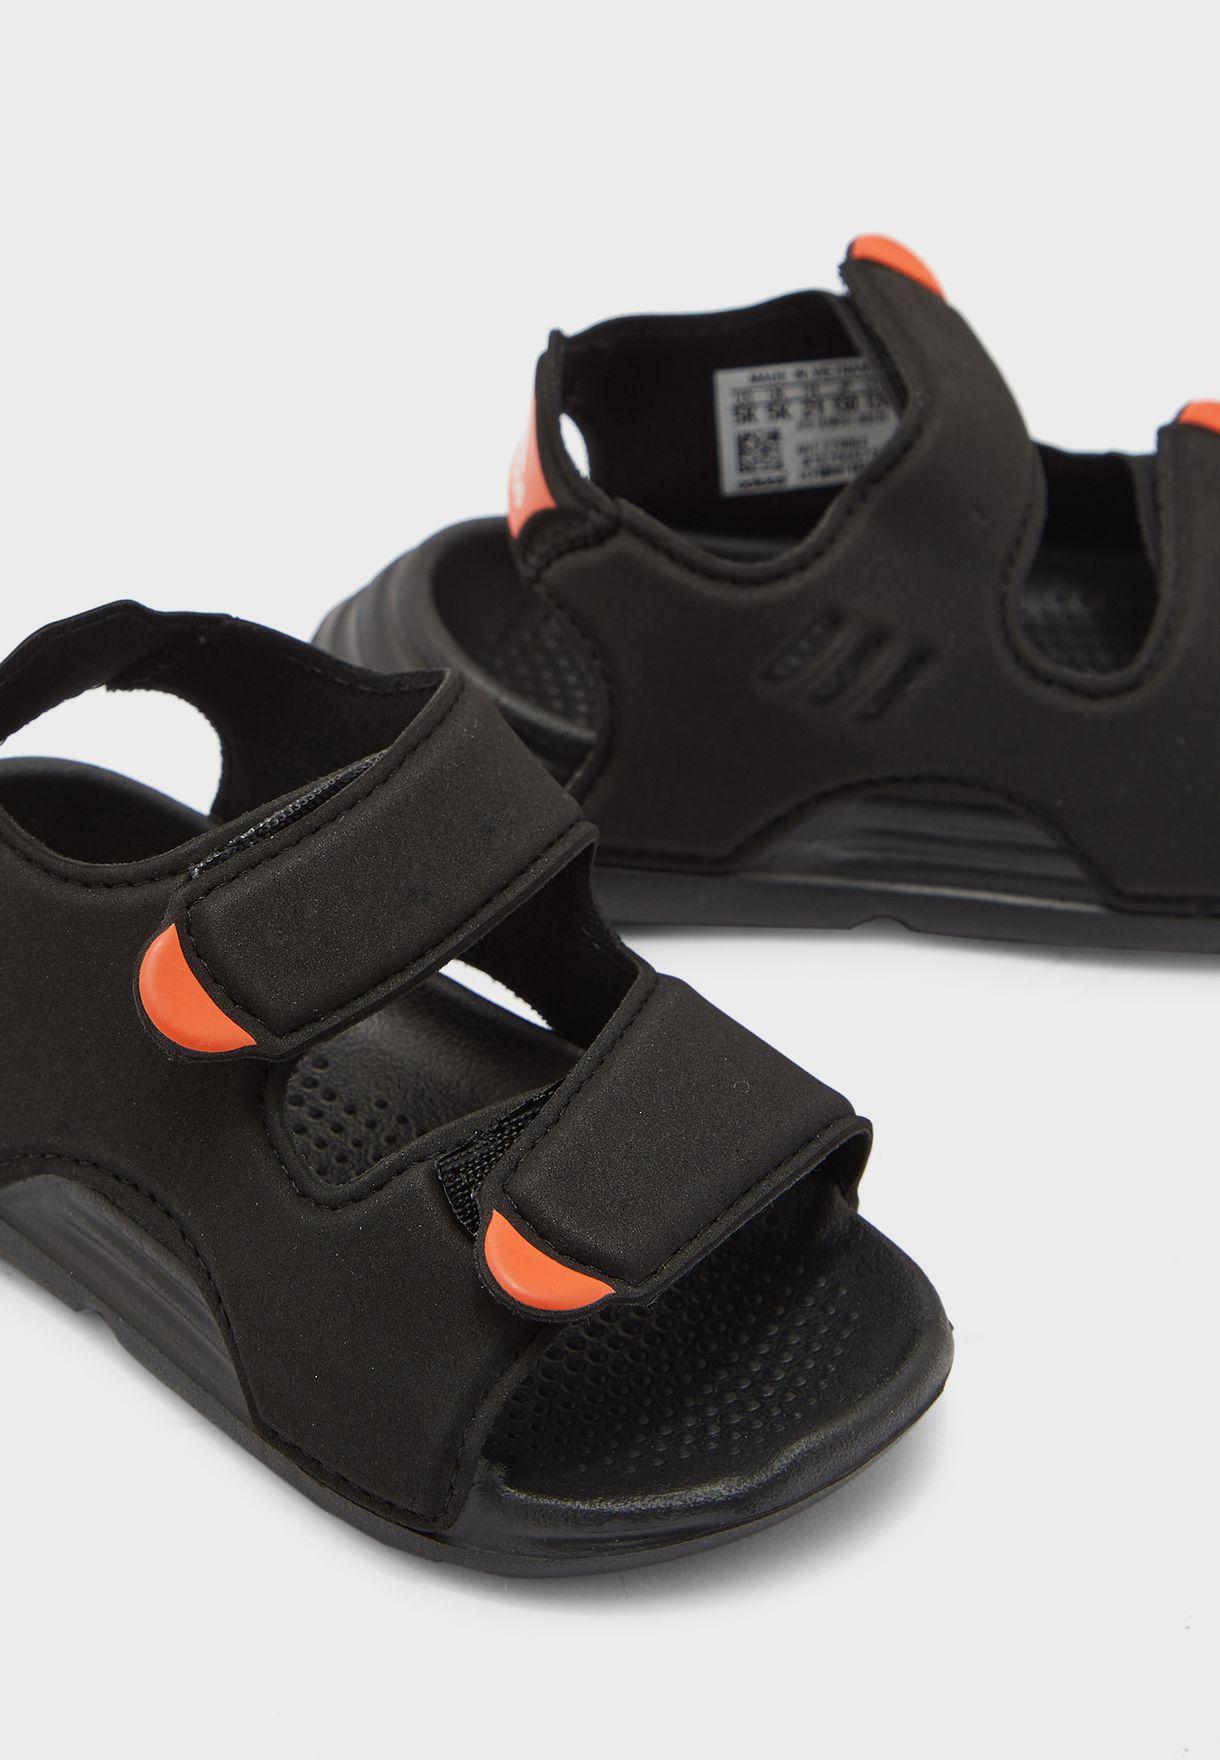 Infant Swim Sandal